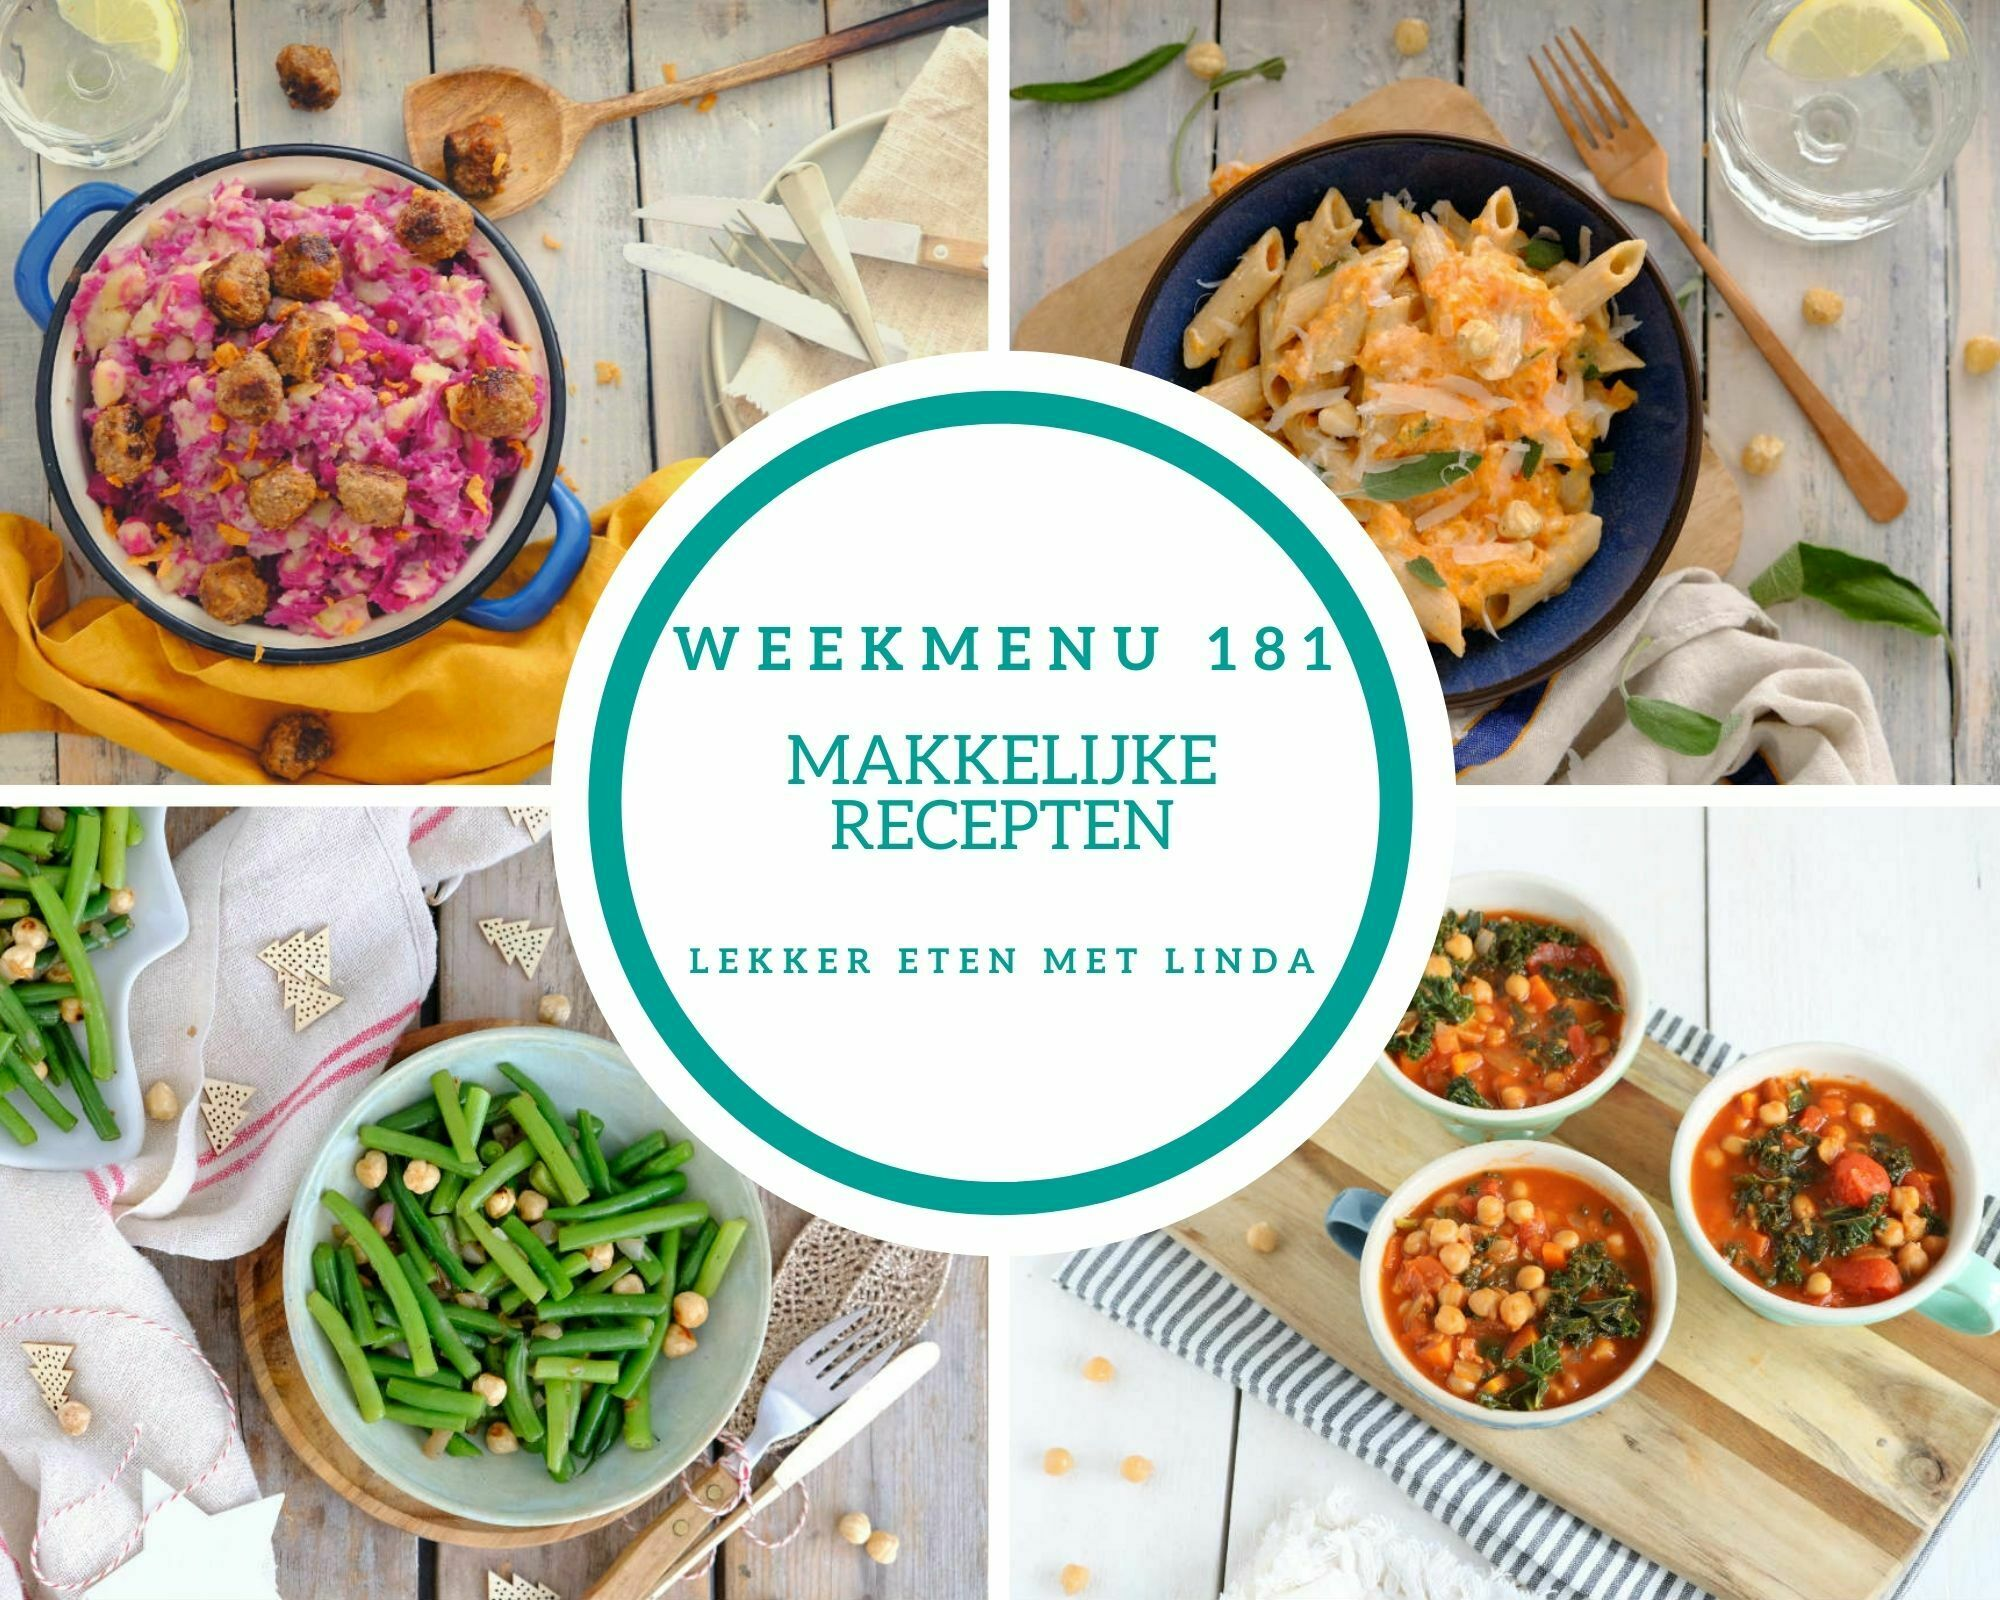 Weekmenu 181 makkelijke recepten